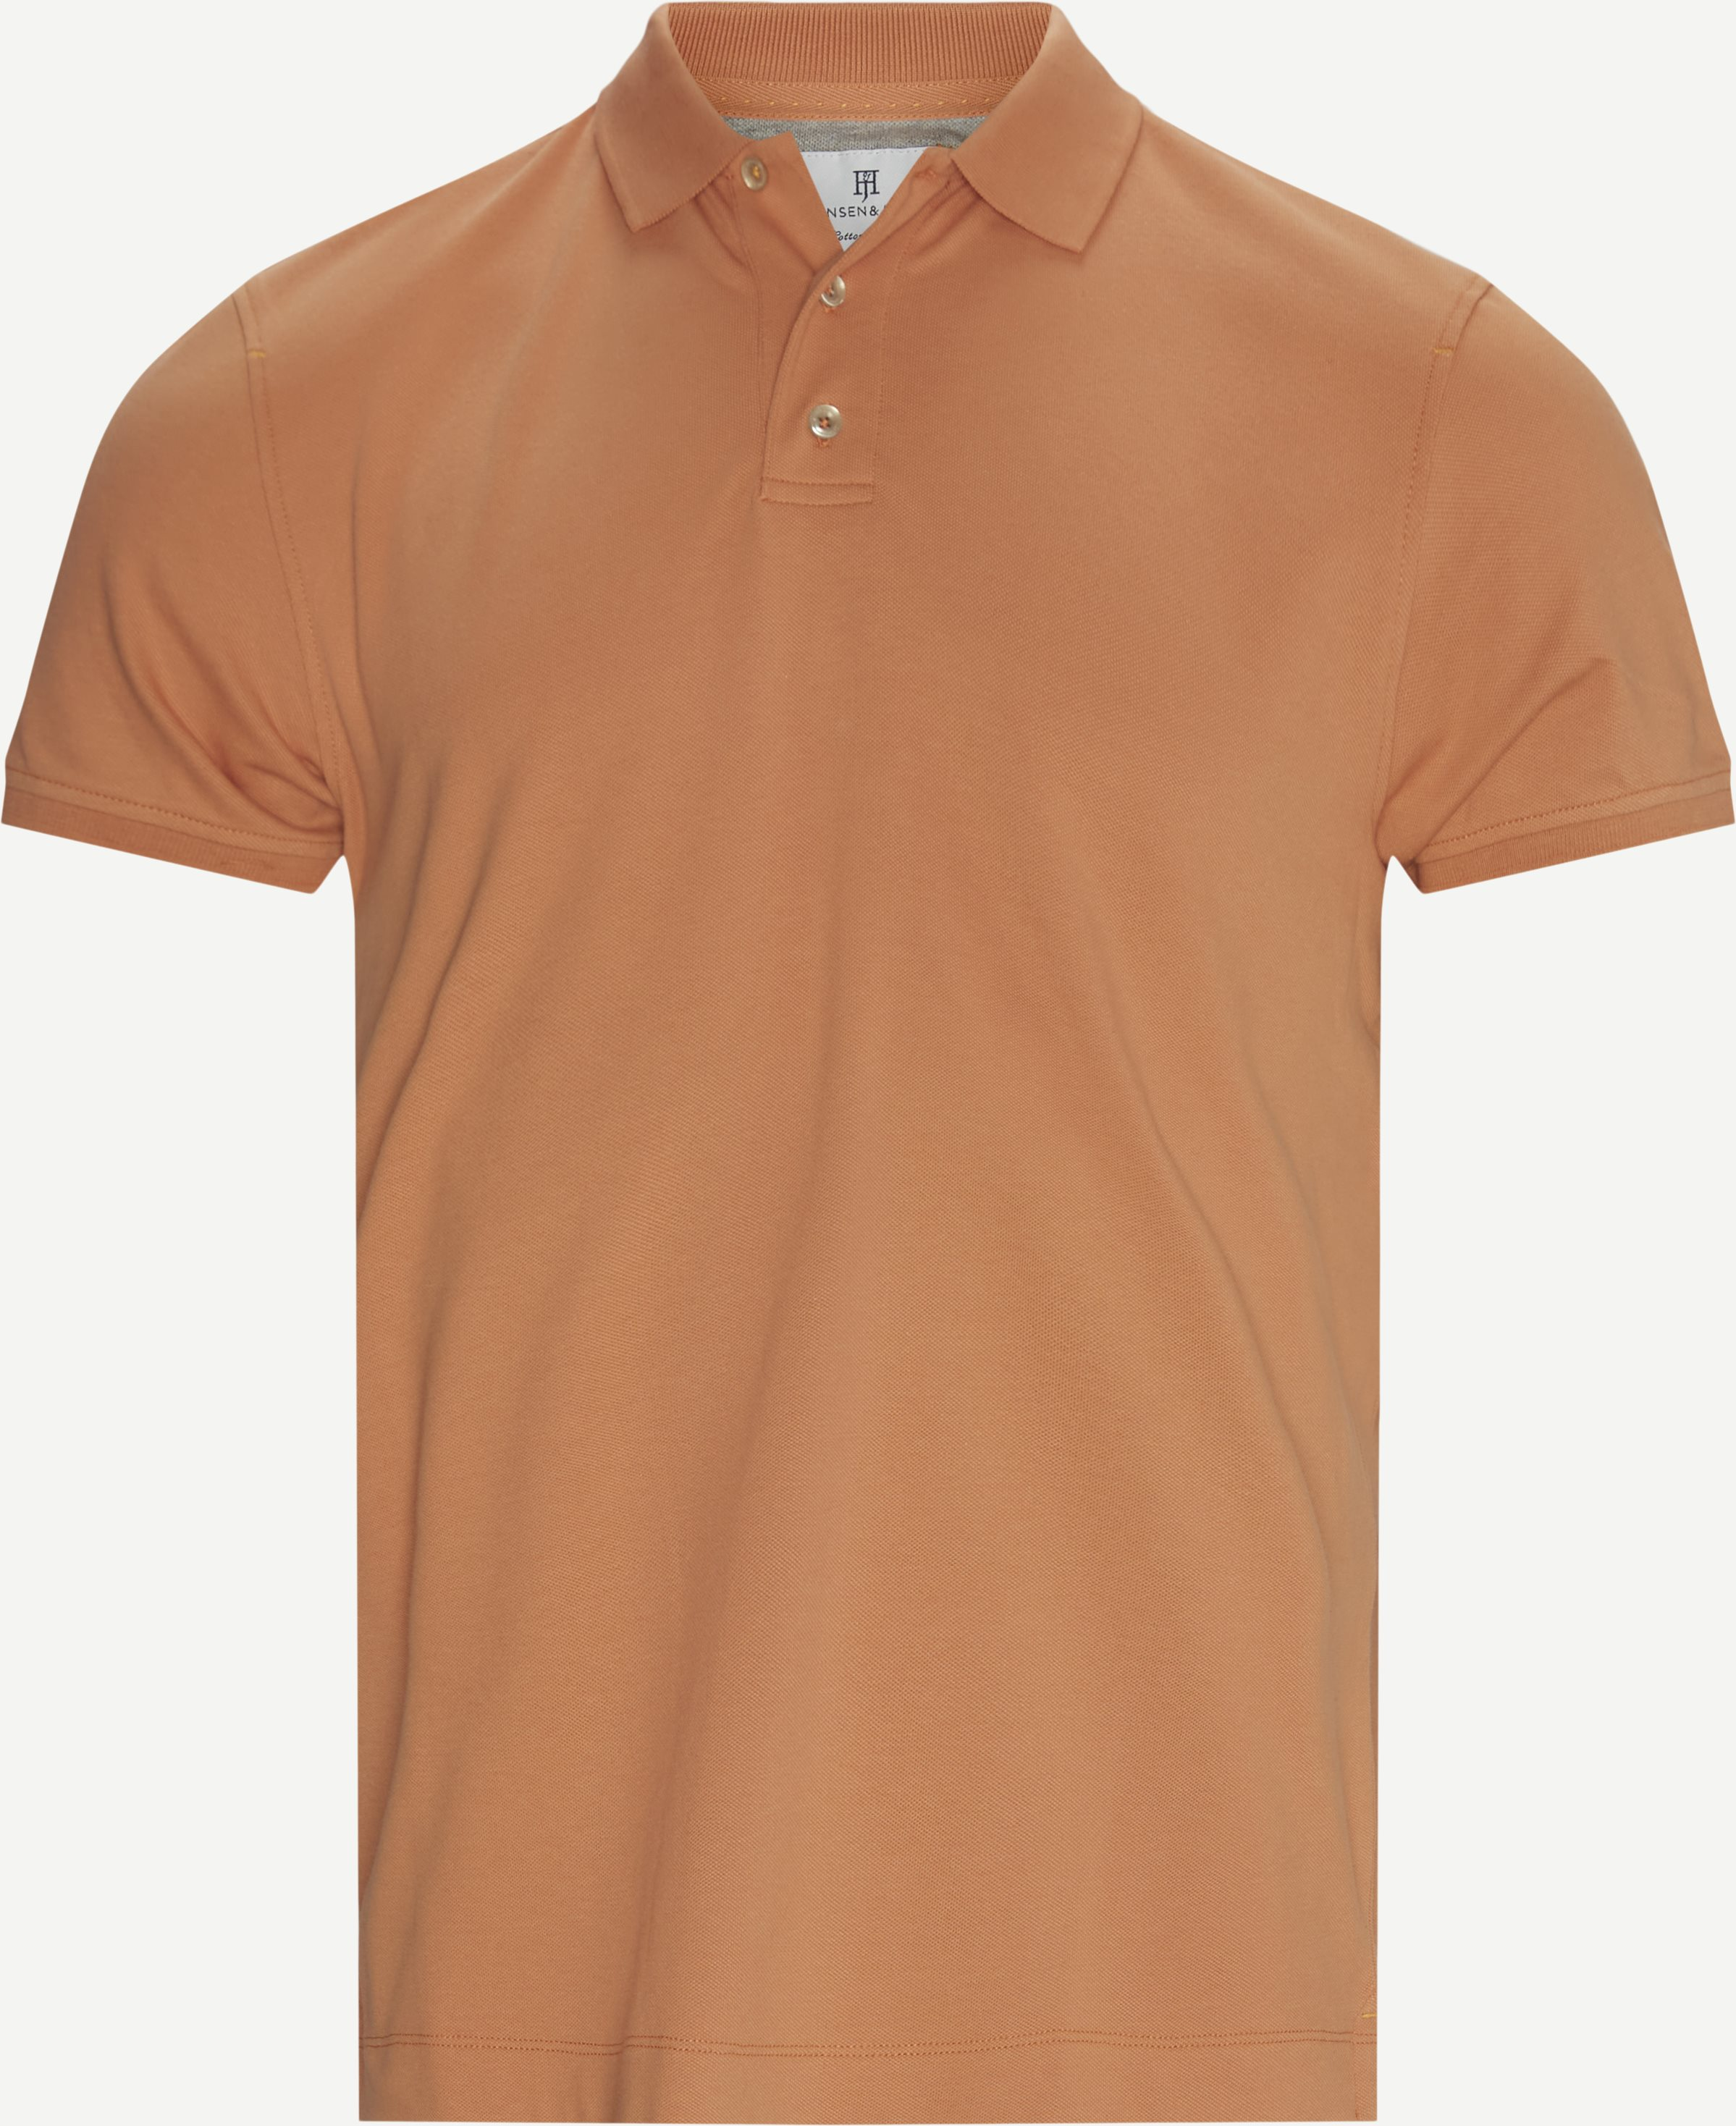 T-Shirts - Orange